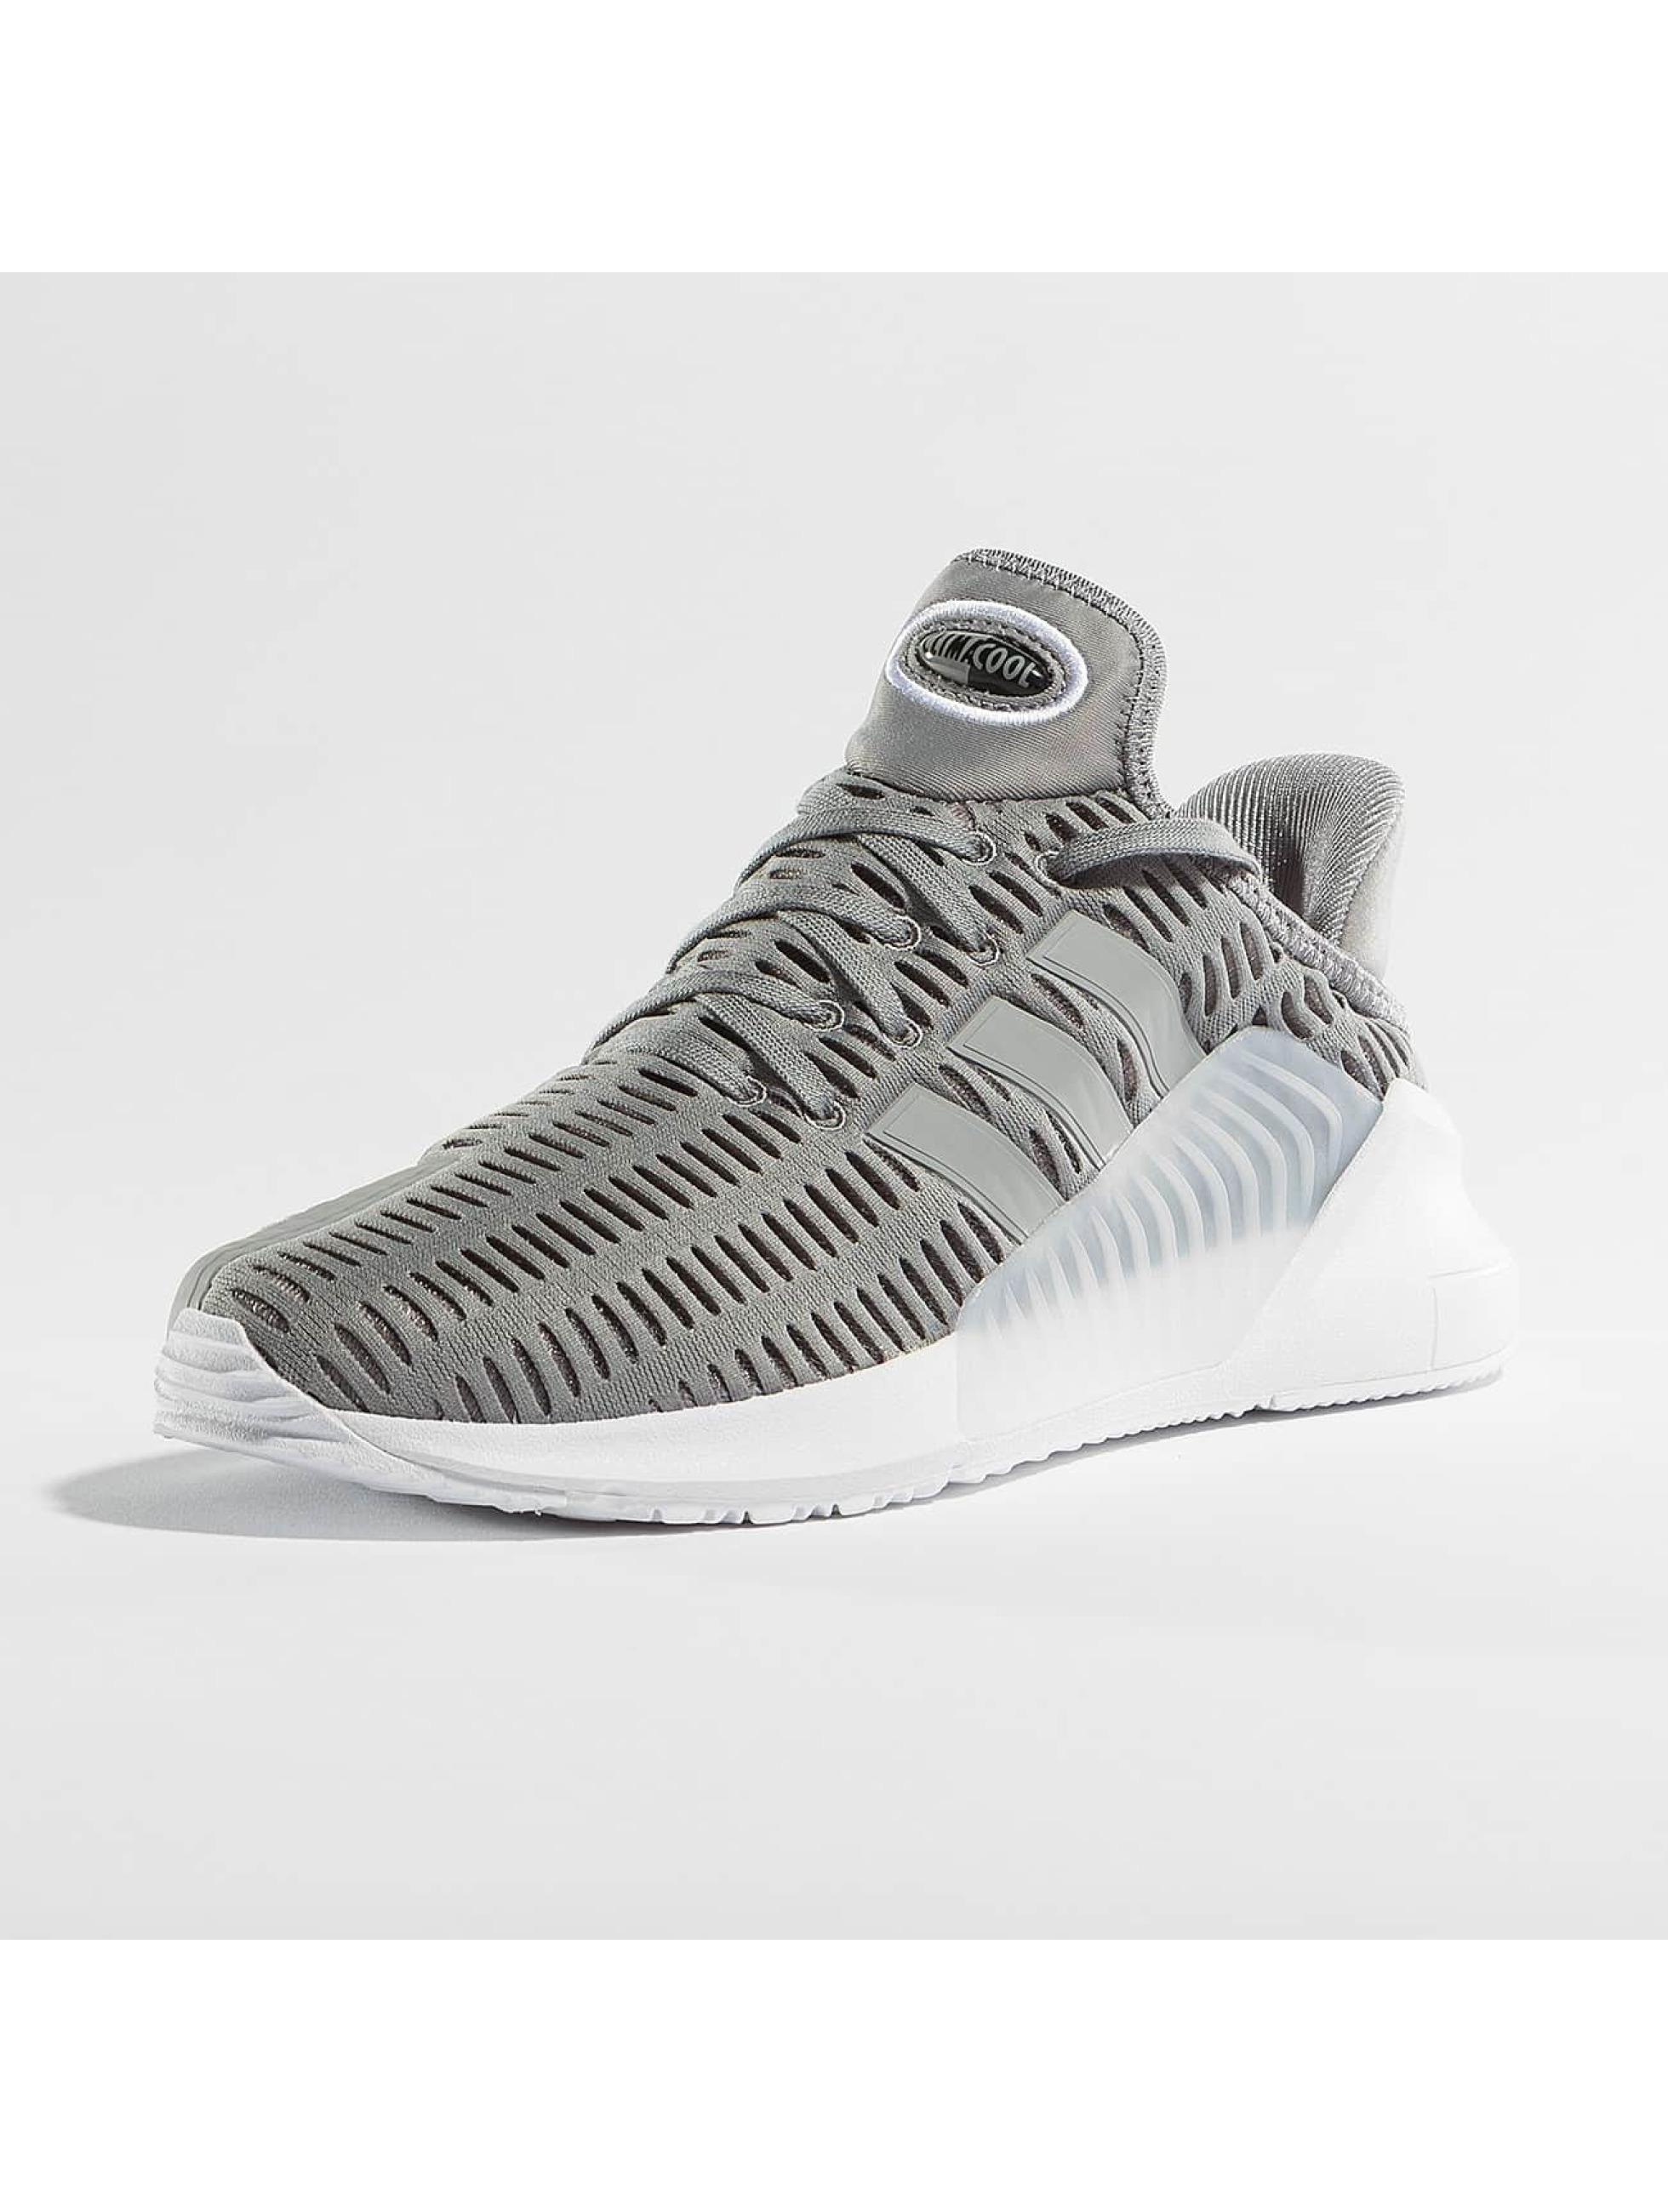 adidas originals Sneakers Climacool 02/17 gray